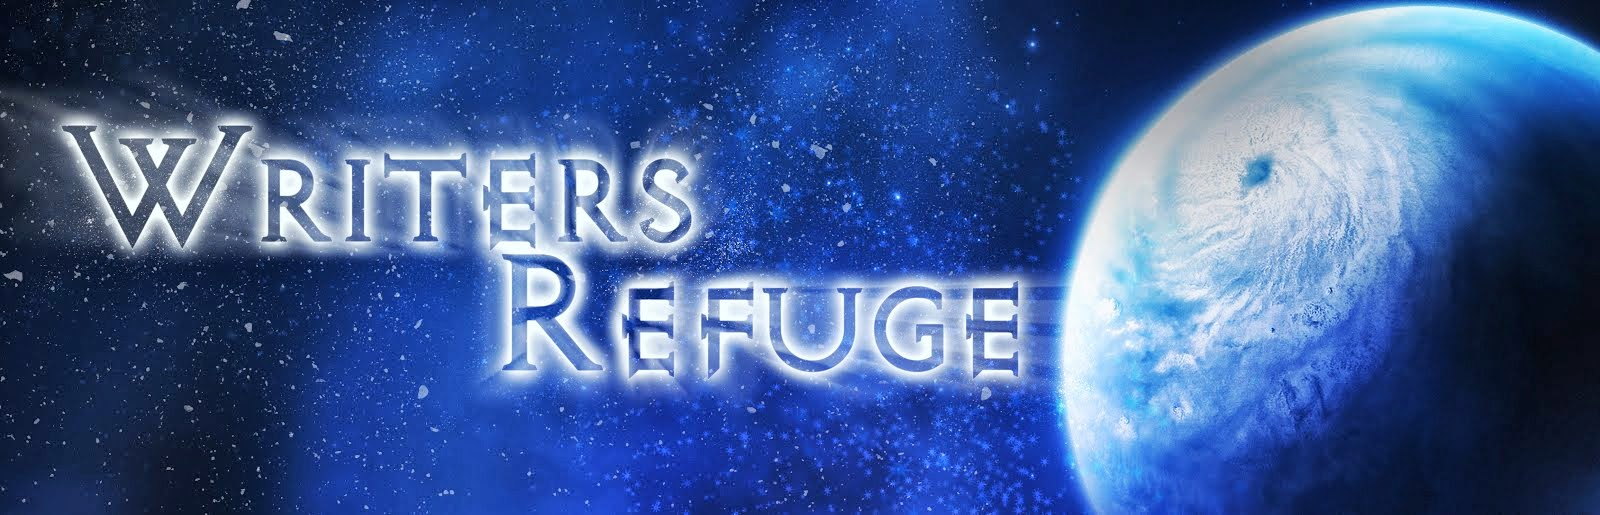 Writer's Refuge